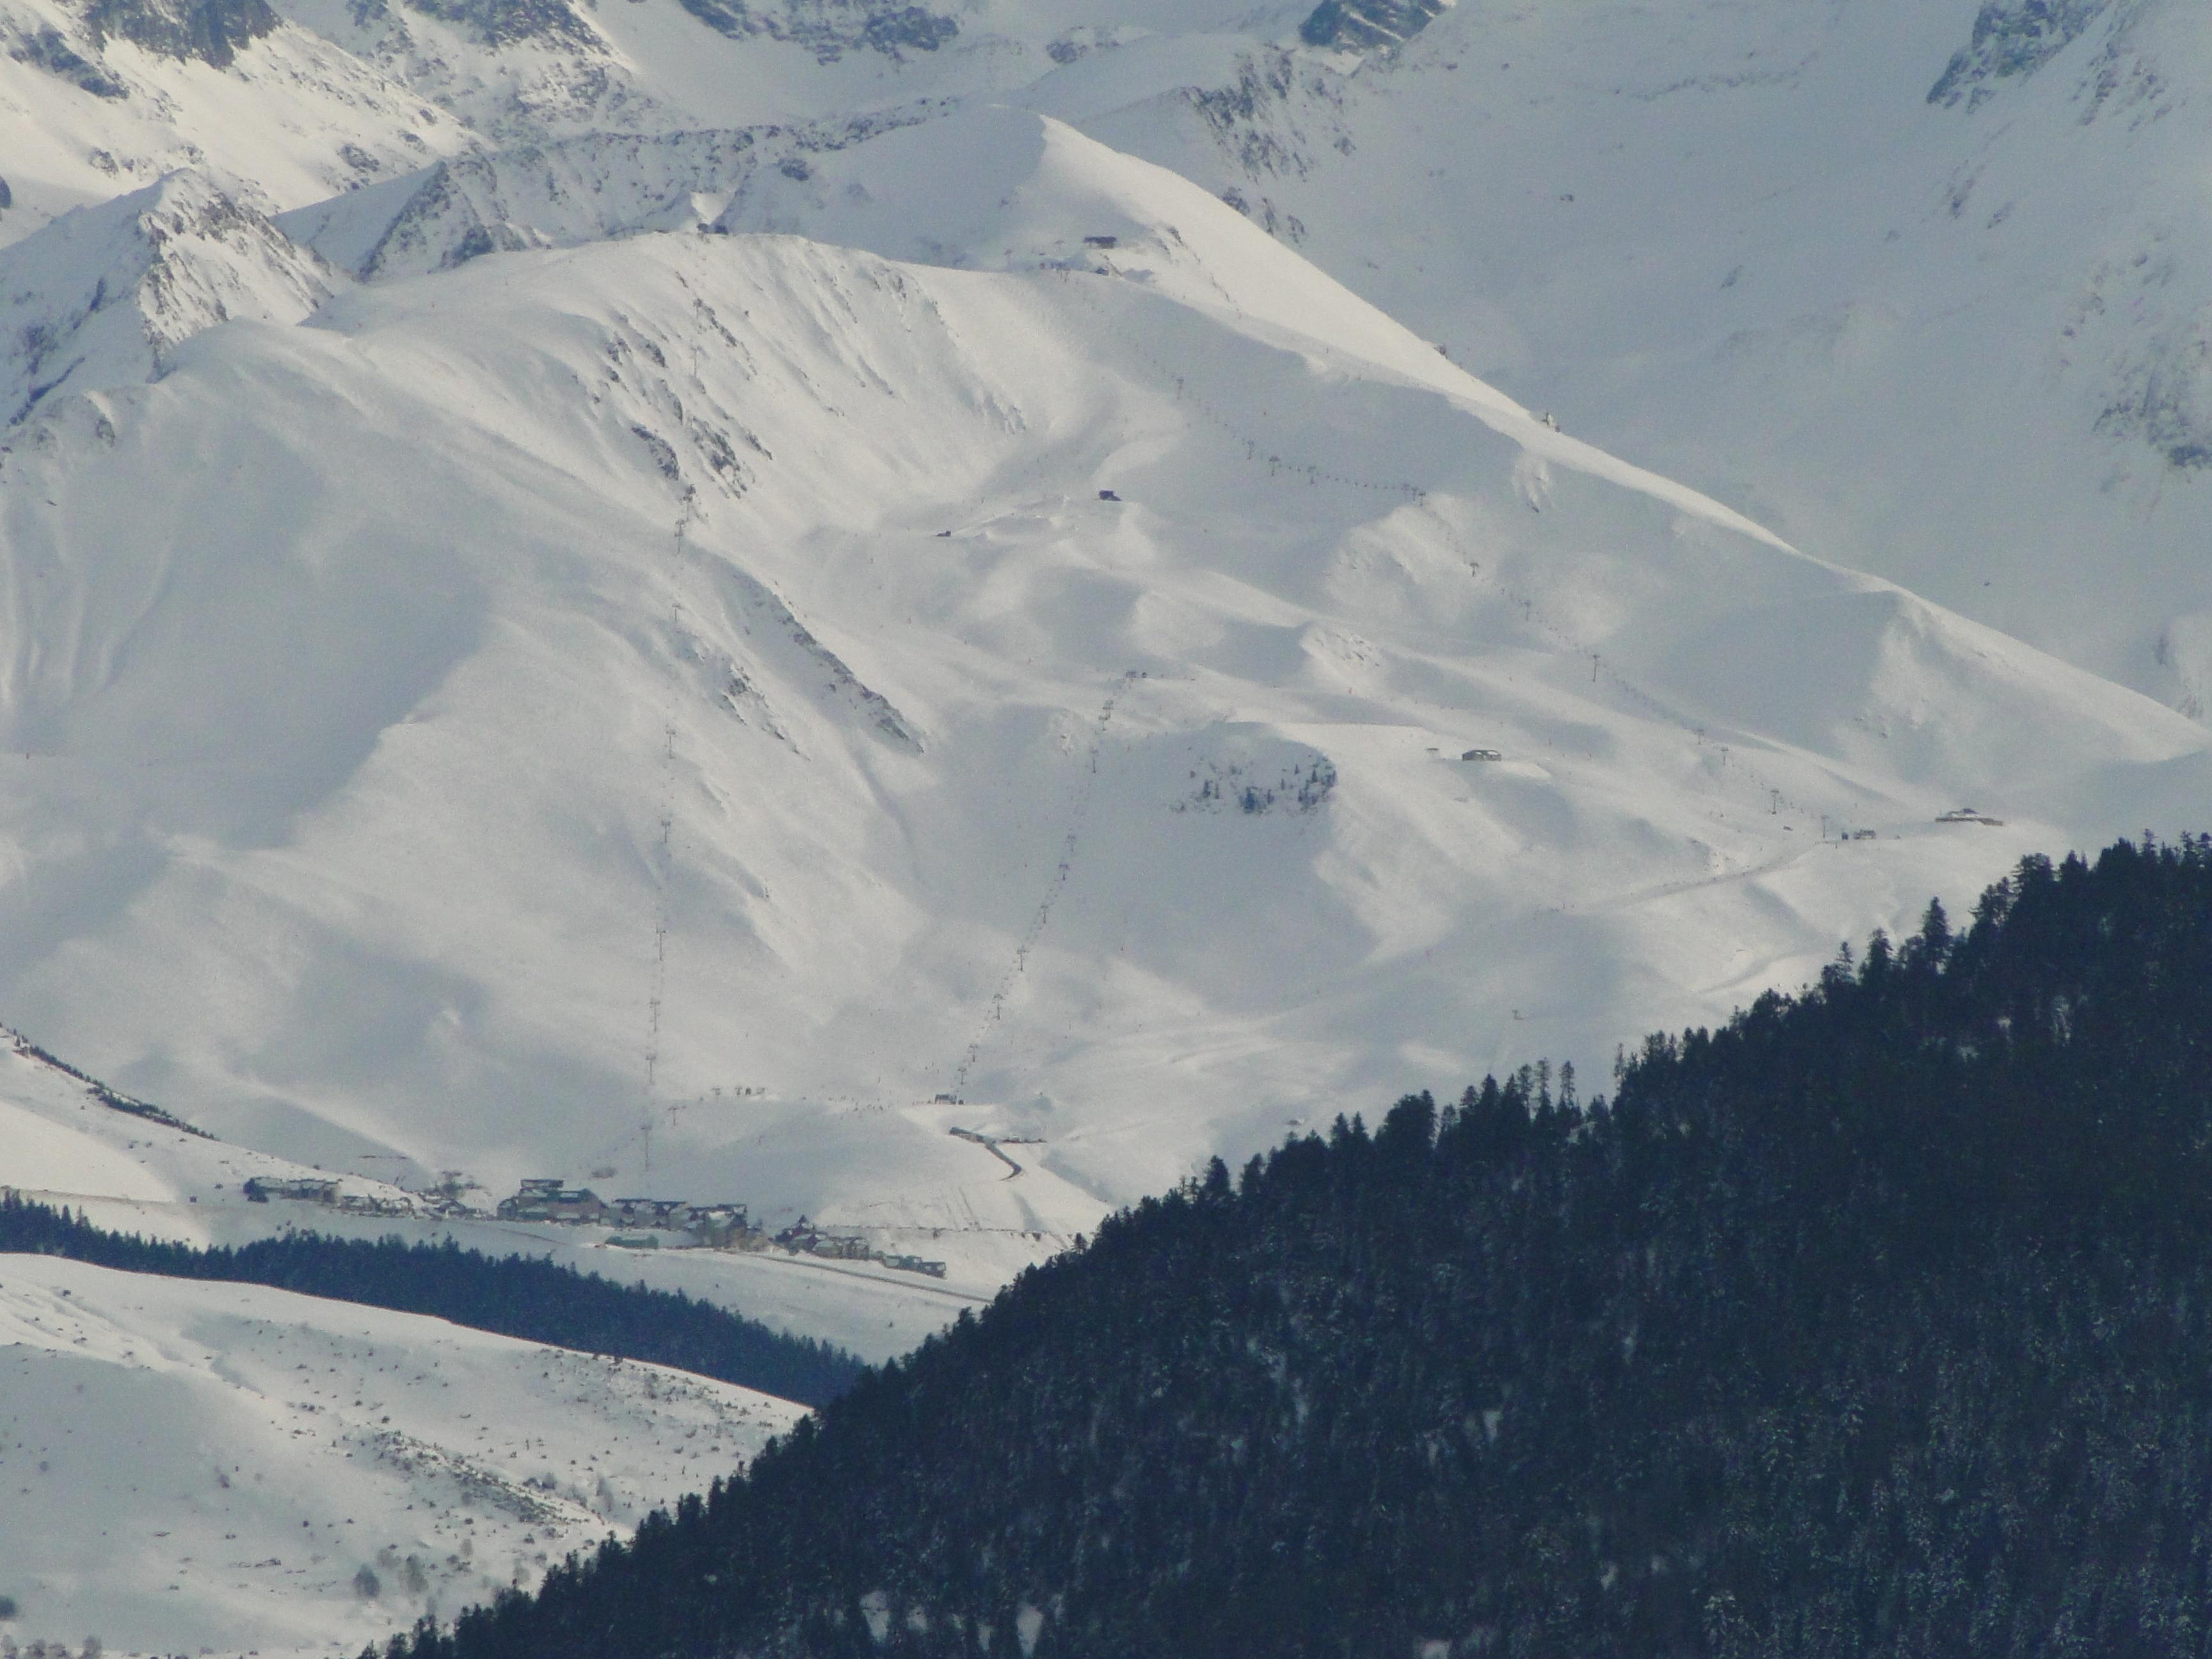 Aspin-Aure, Hautes-Pyrenees, France